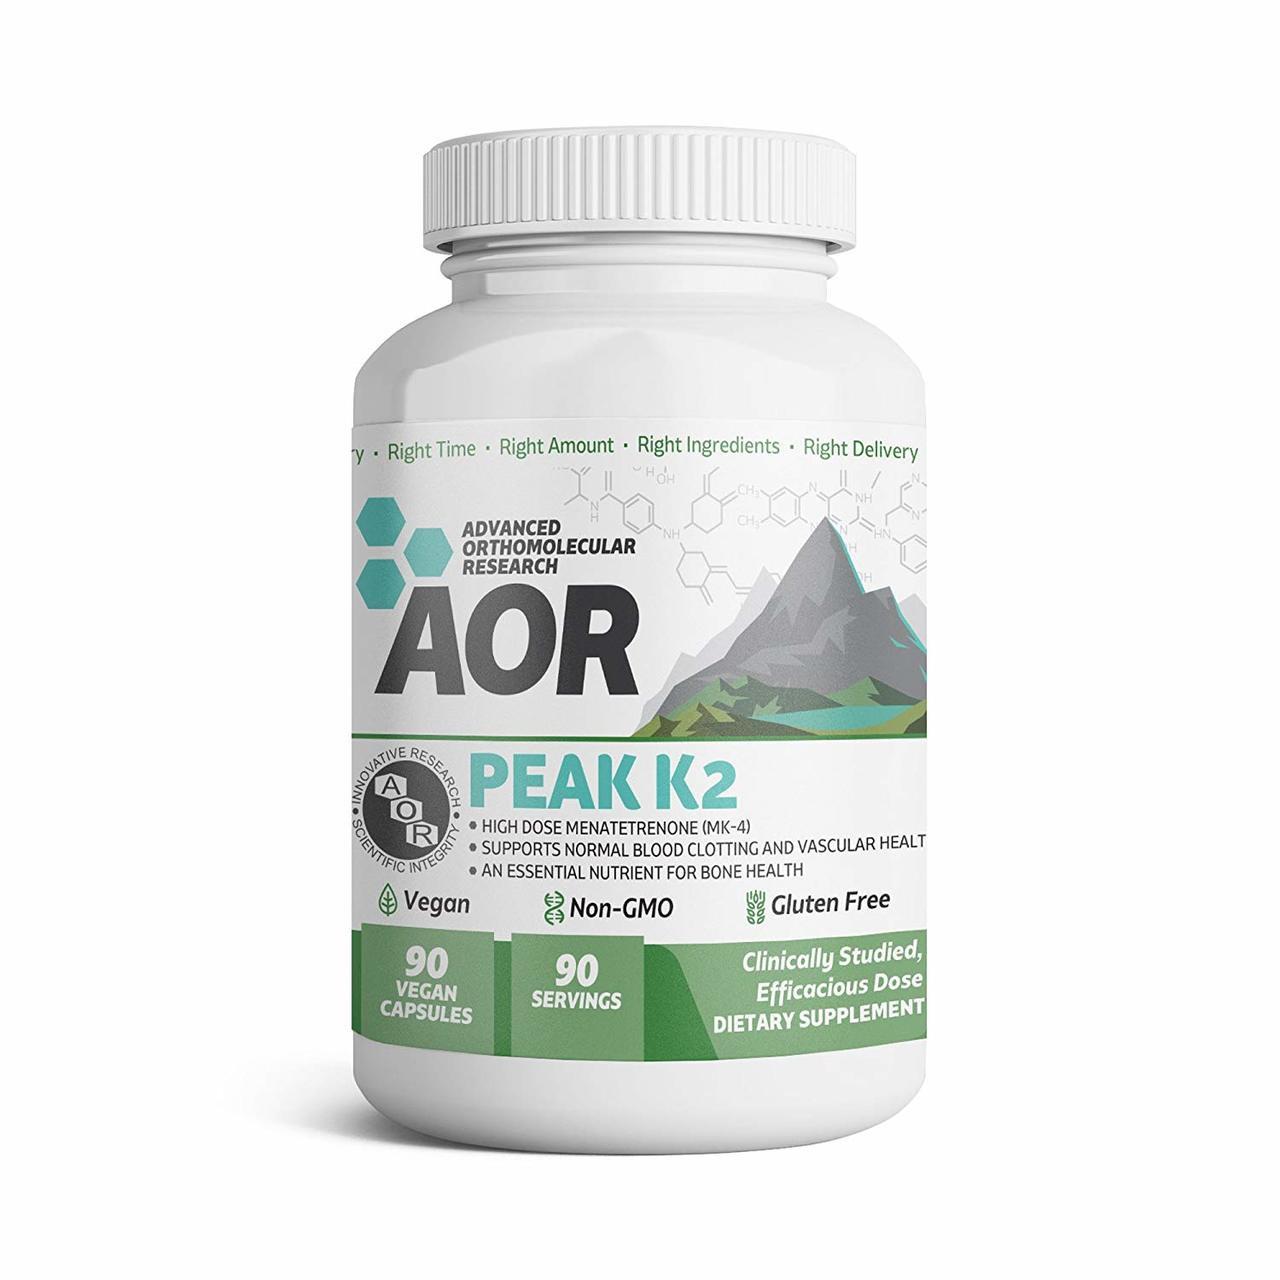 Buy Peak K2 Advanced Series 90 Caps, Orthomolecular Research